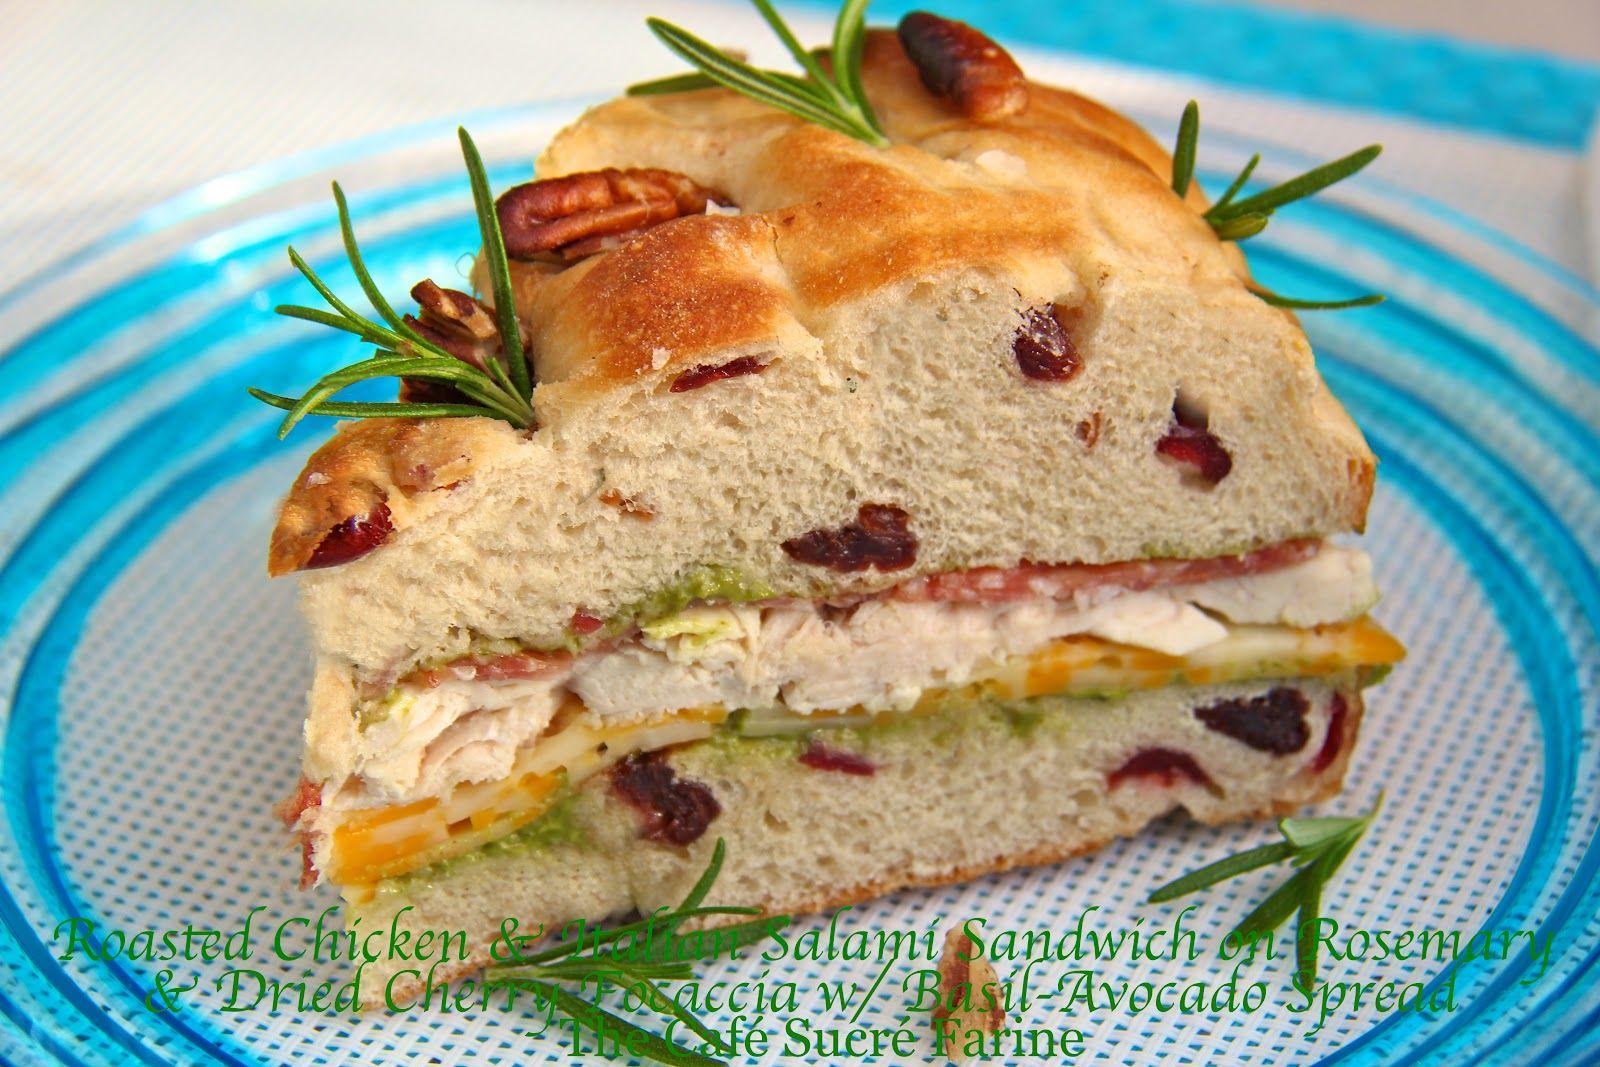 The Café Sucré Farine: Roasted Chicken & Italian Salami Sandwich on Rosemary & Dried Cherry Focaccia w/ Basil-Avocado Spread